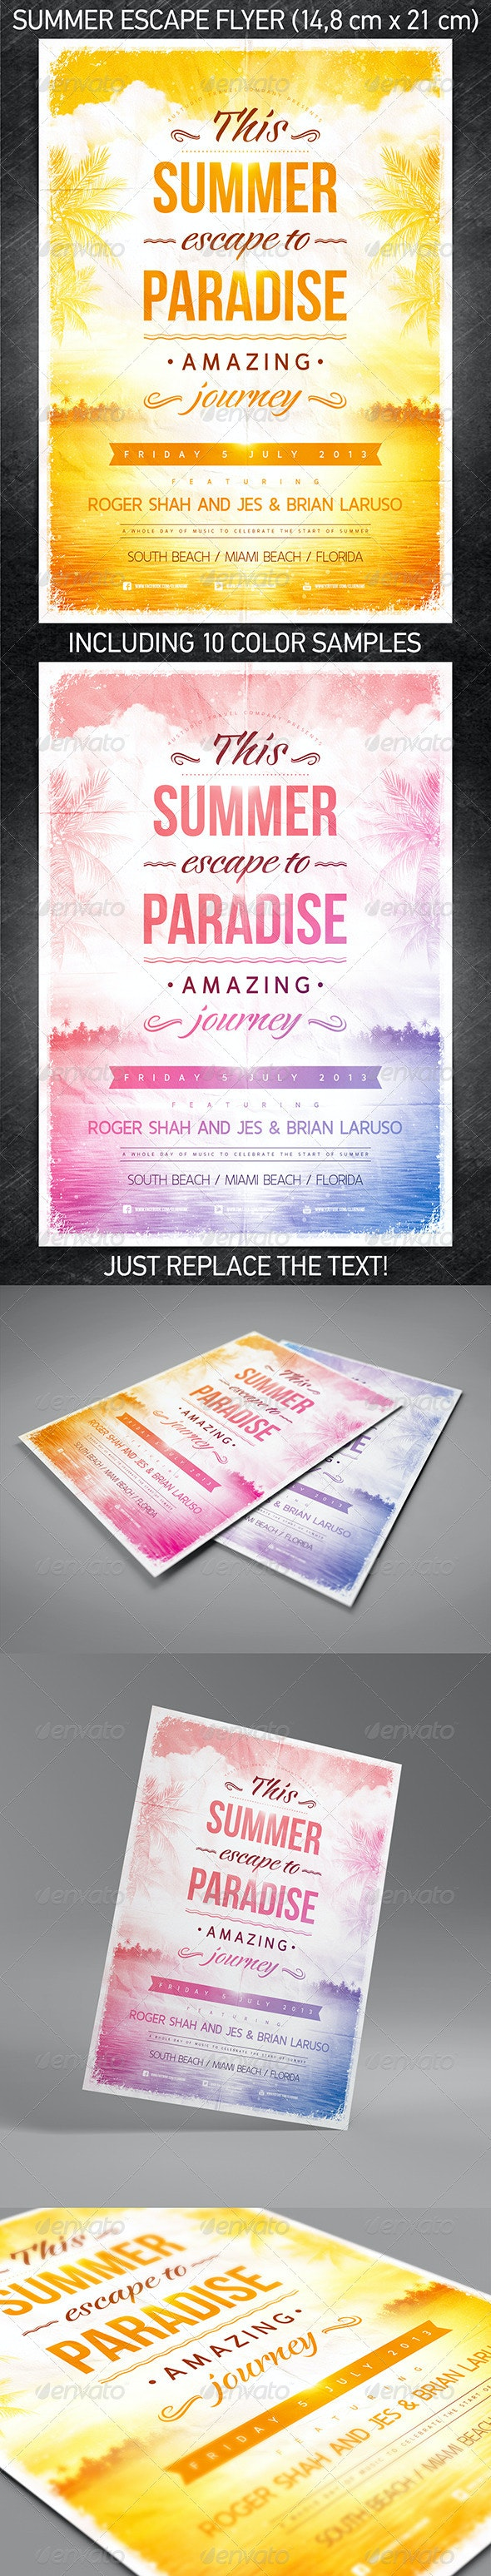 Summer Escape Party Flyer - Flyers Print Templates